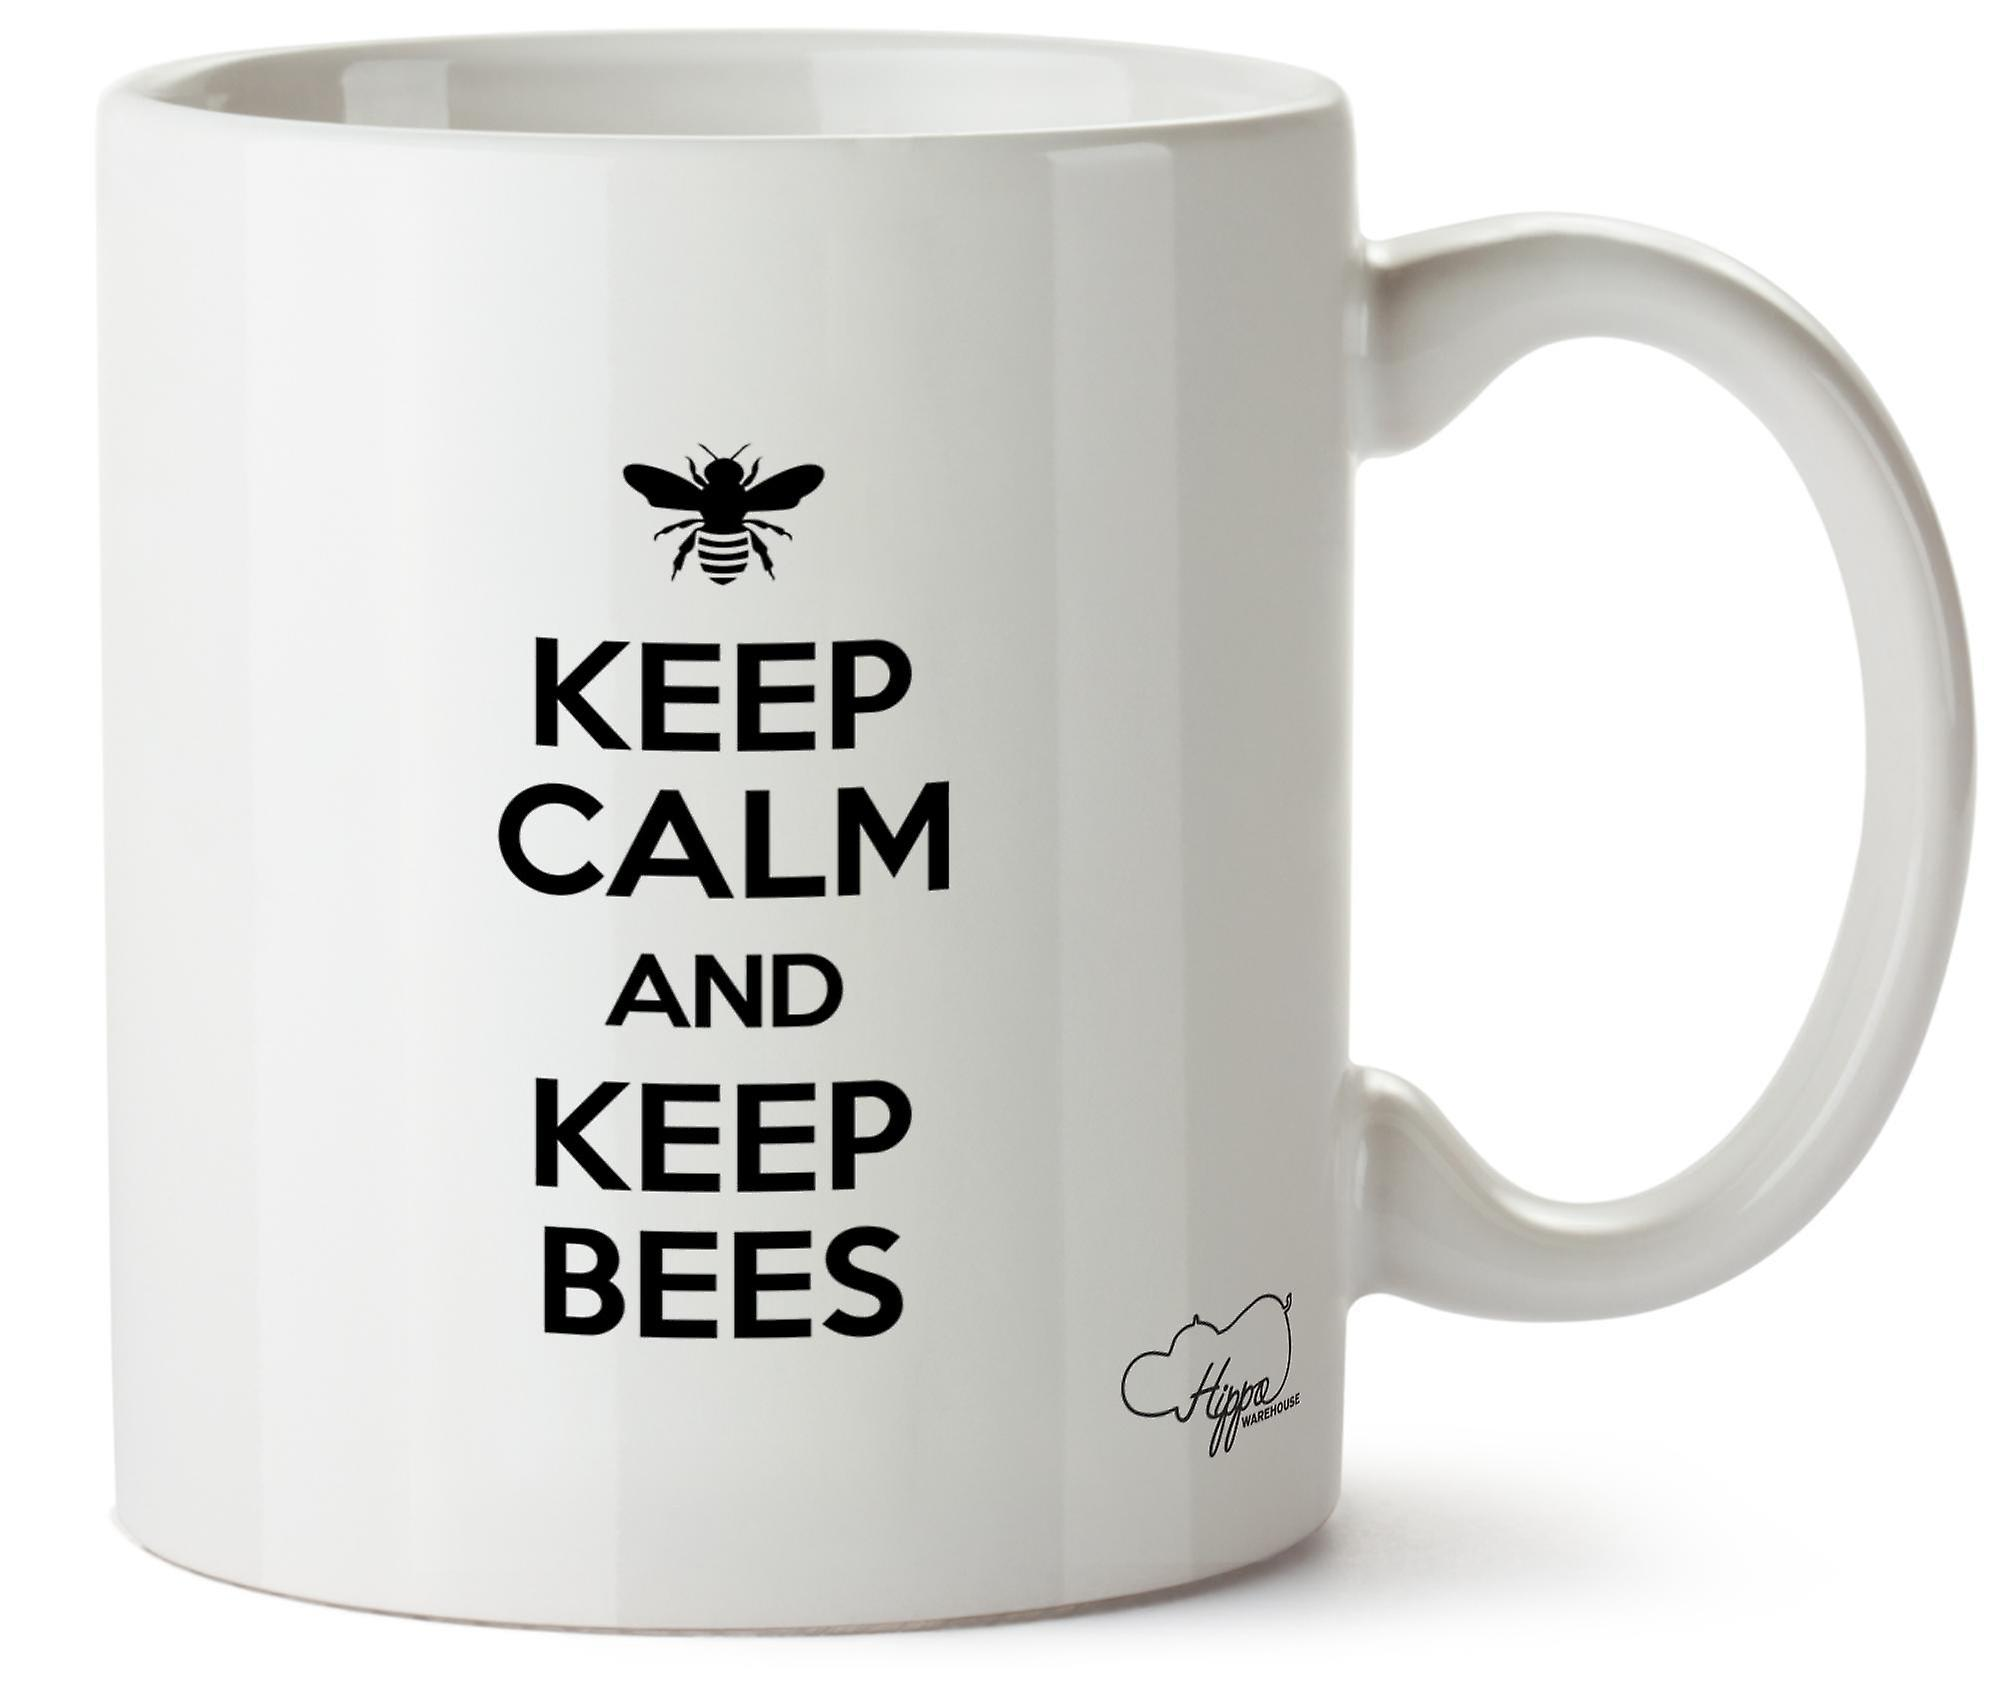 Hippowarehouse Keep Calm And Keep Bees Beekeeping Printed Mug Cup Ceramic 10oz